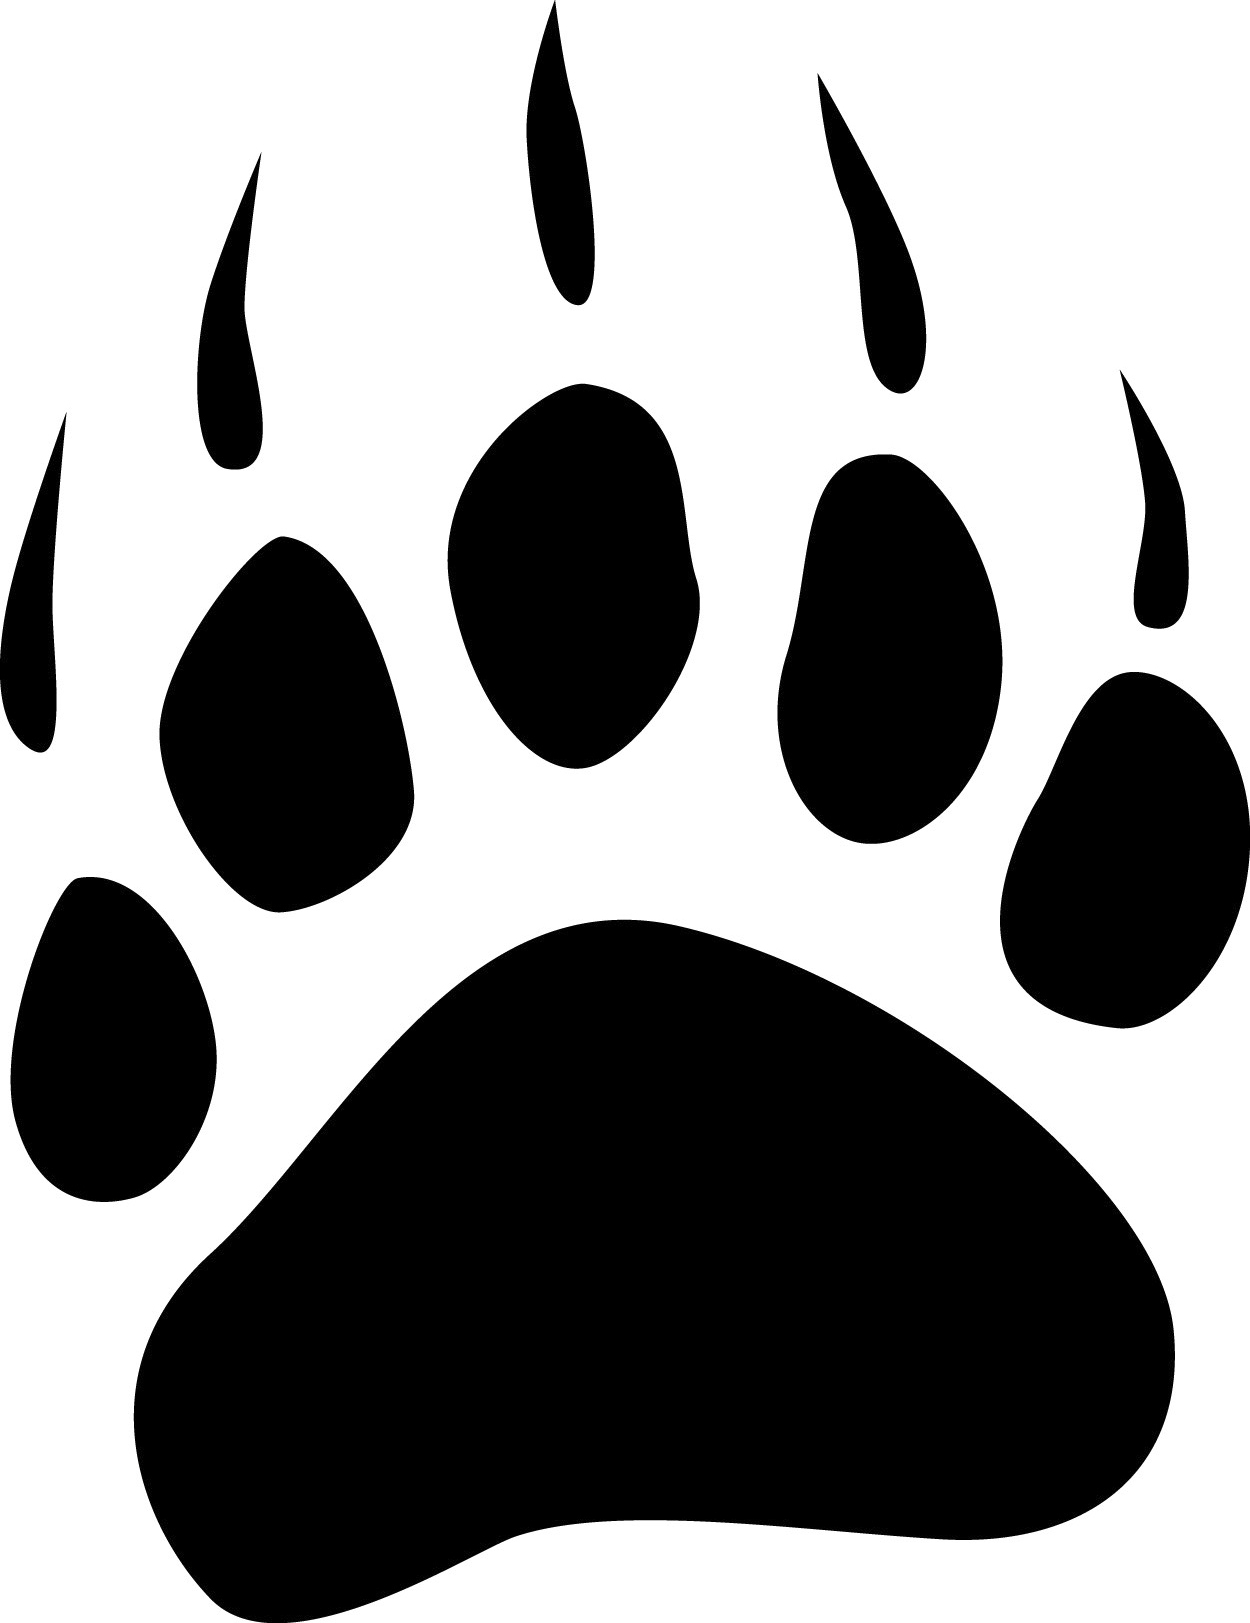 Free Bear Foot Print, Download Free Clip Art, Free Clip Art.